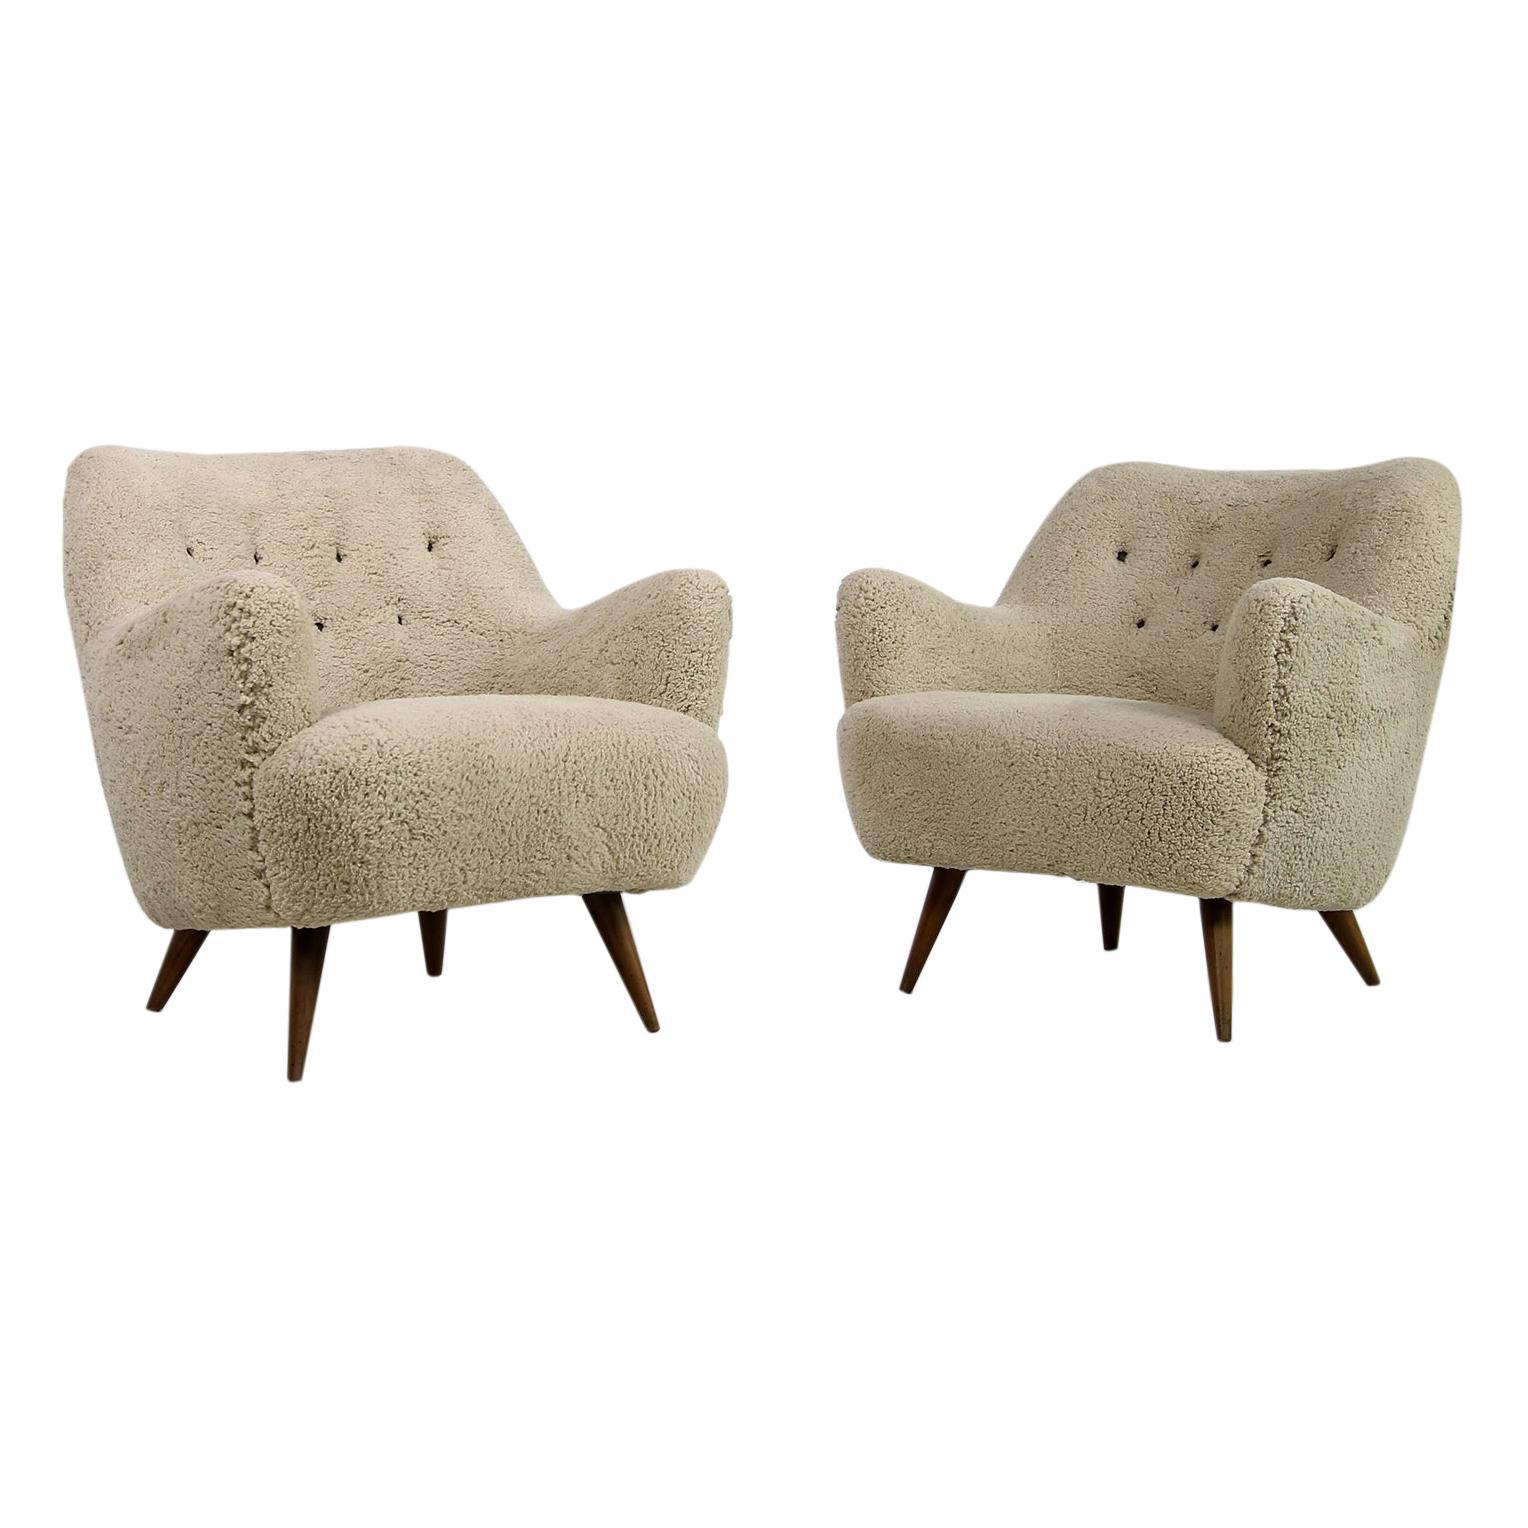 Pair of 1950s Danish Modern Organic Lounge Chairs Faux Sheepskin, Denmark